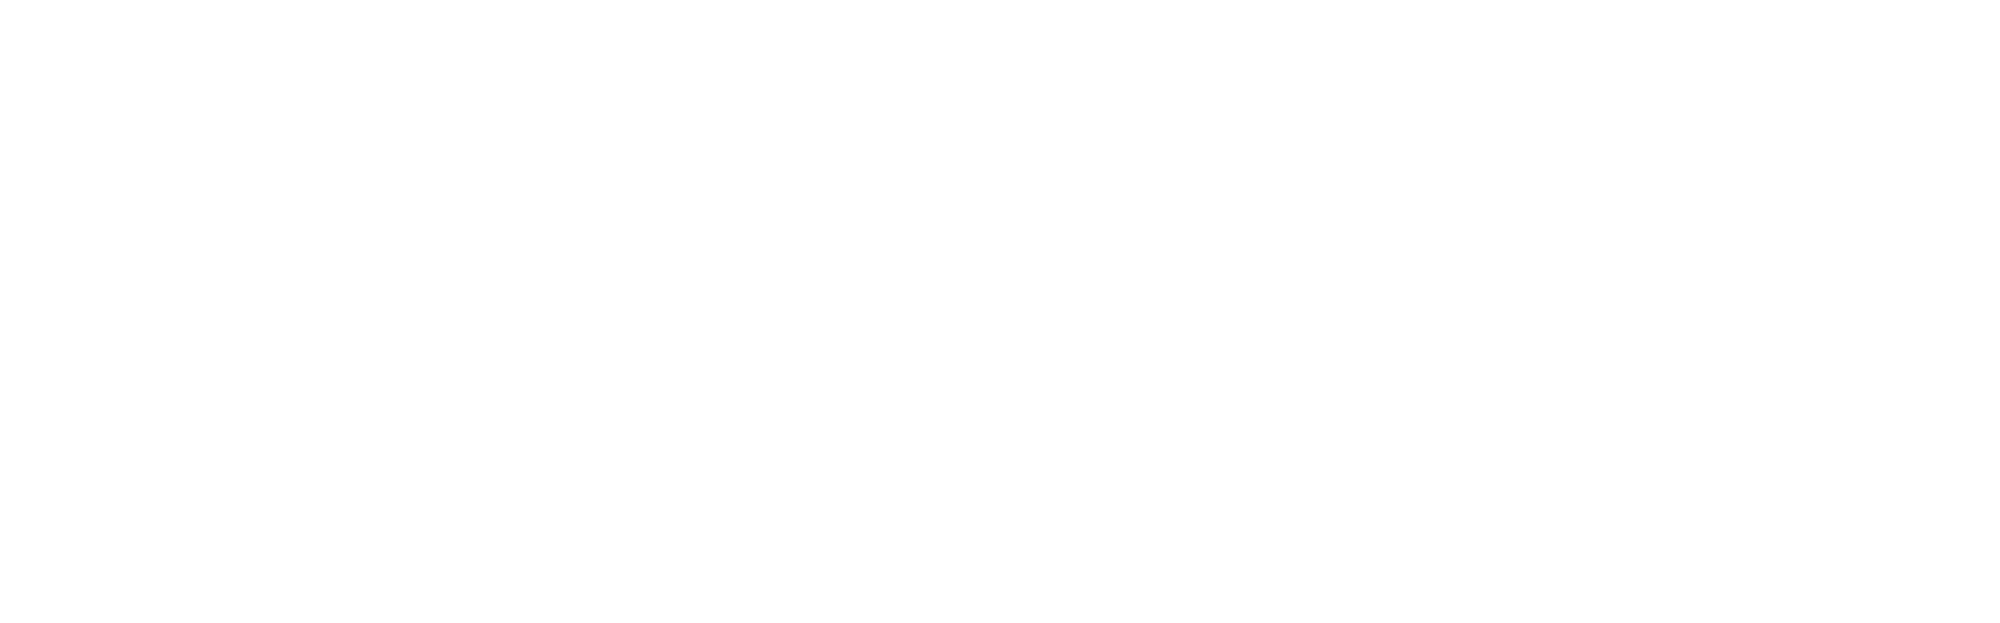 nichiyu-electric-forklift